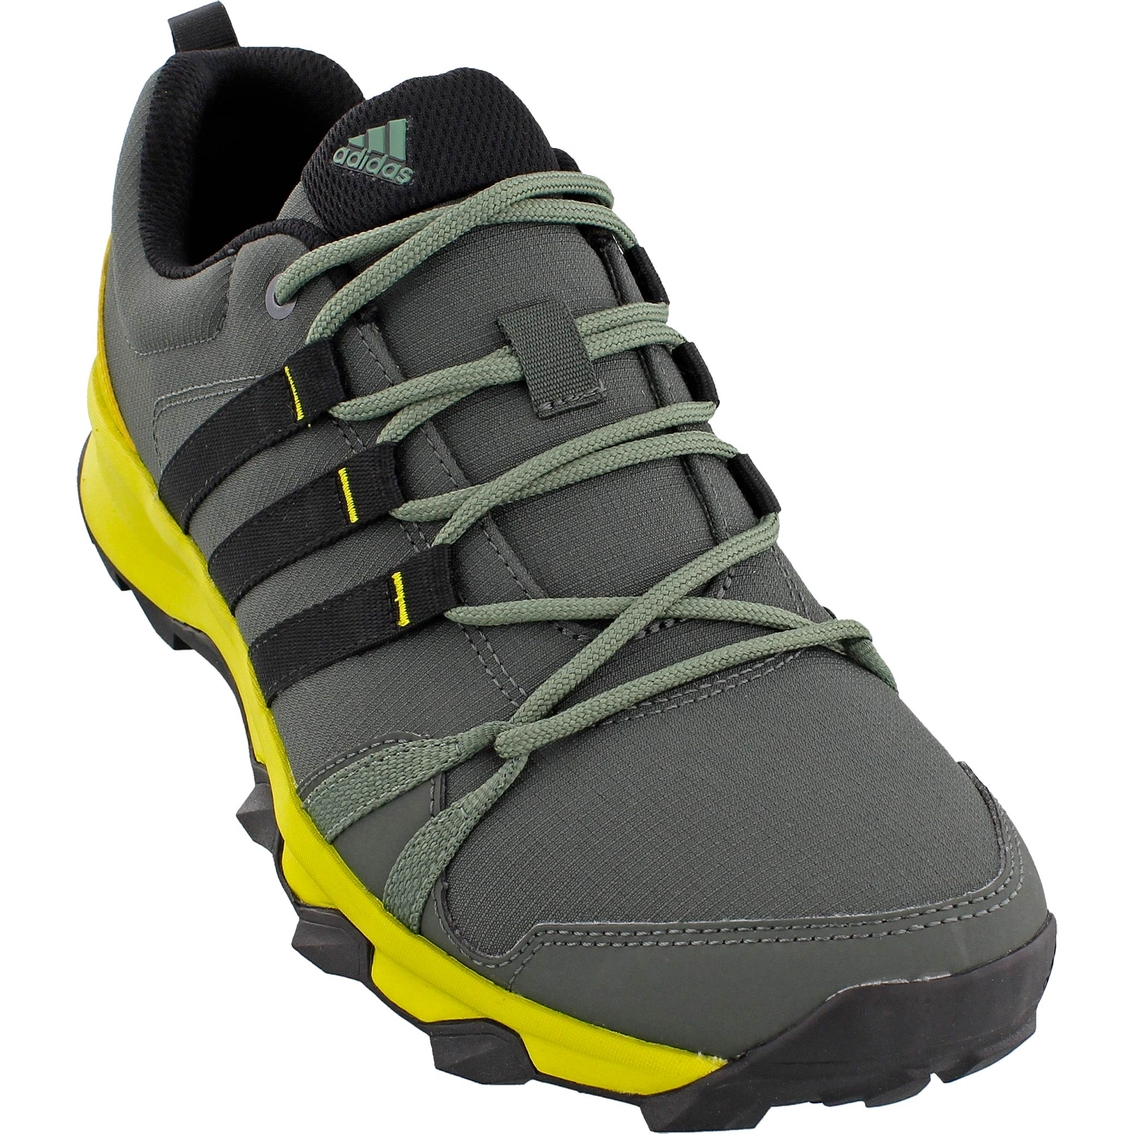 huge selection of d0227 b5c59 adidas Outdoor Men s Tracerocker Hiking Shoes